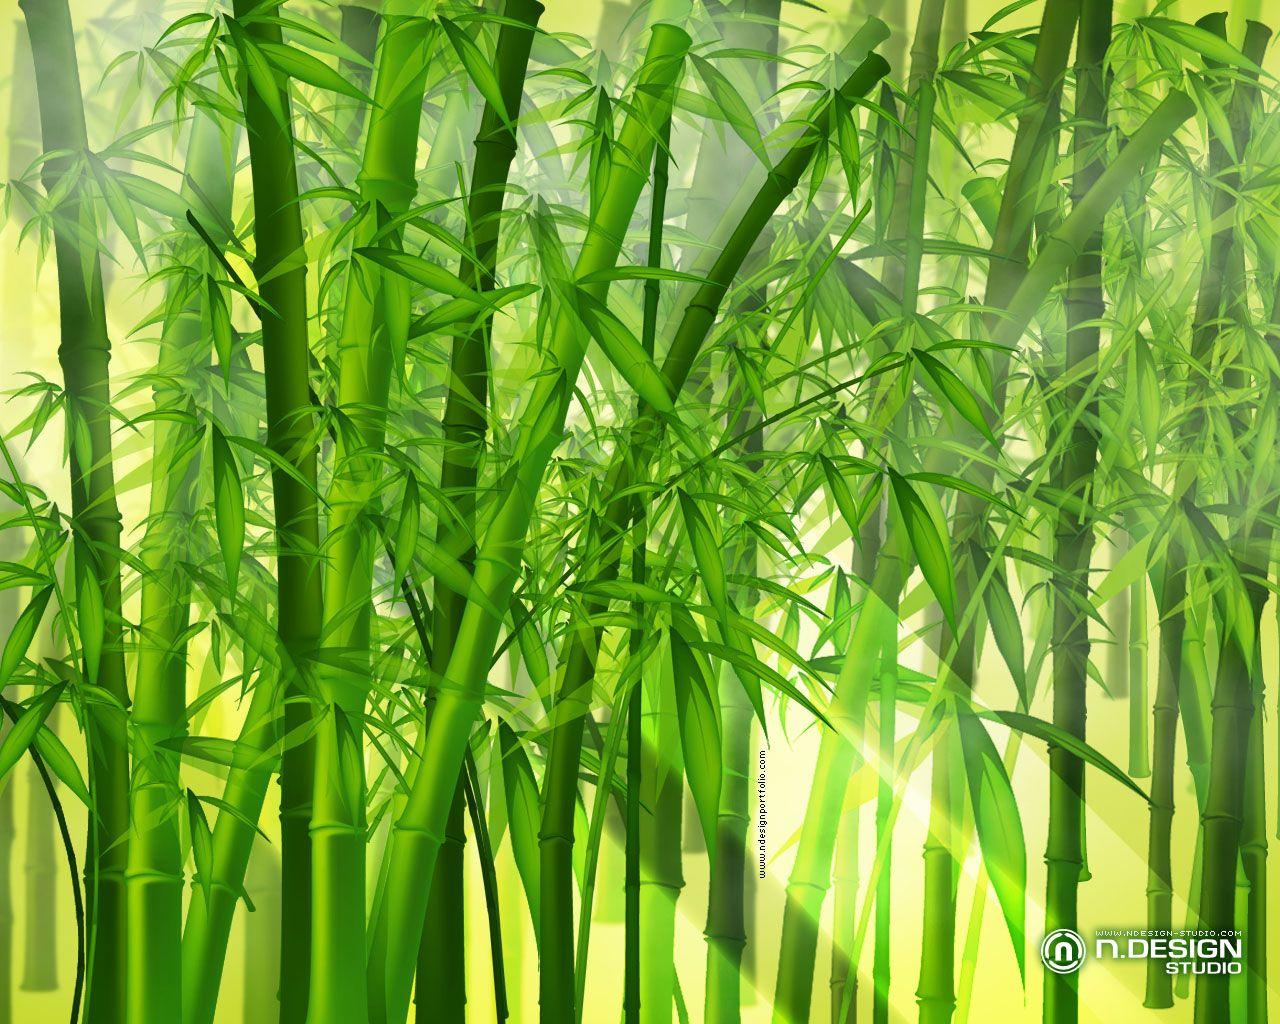 anime bamboo wallpaper design